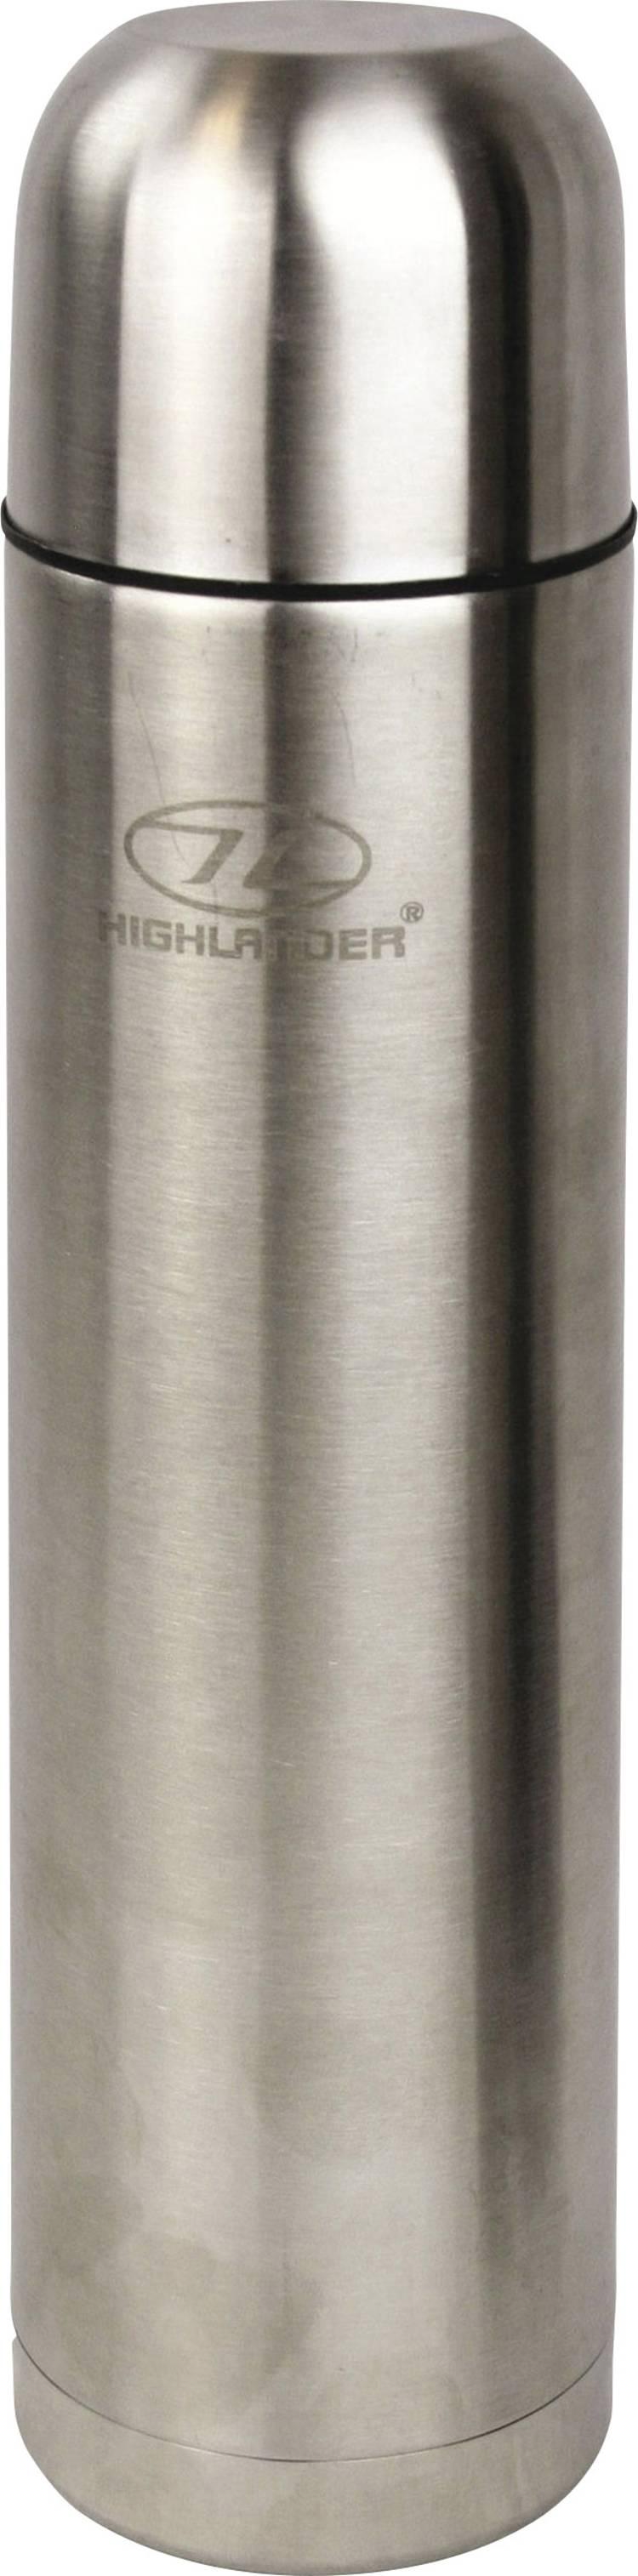 Image of Highlander Tufflasks FLA104 Thermosfles Zilver 1000 ml